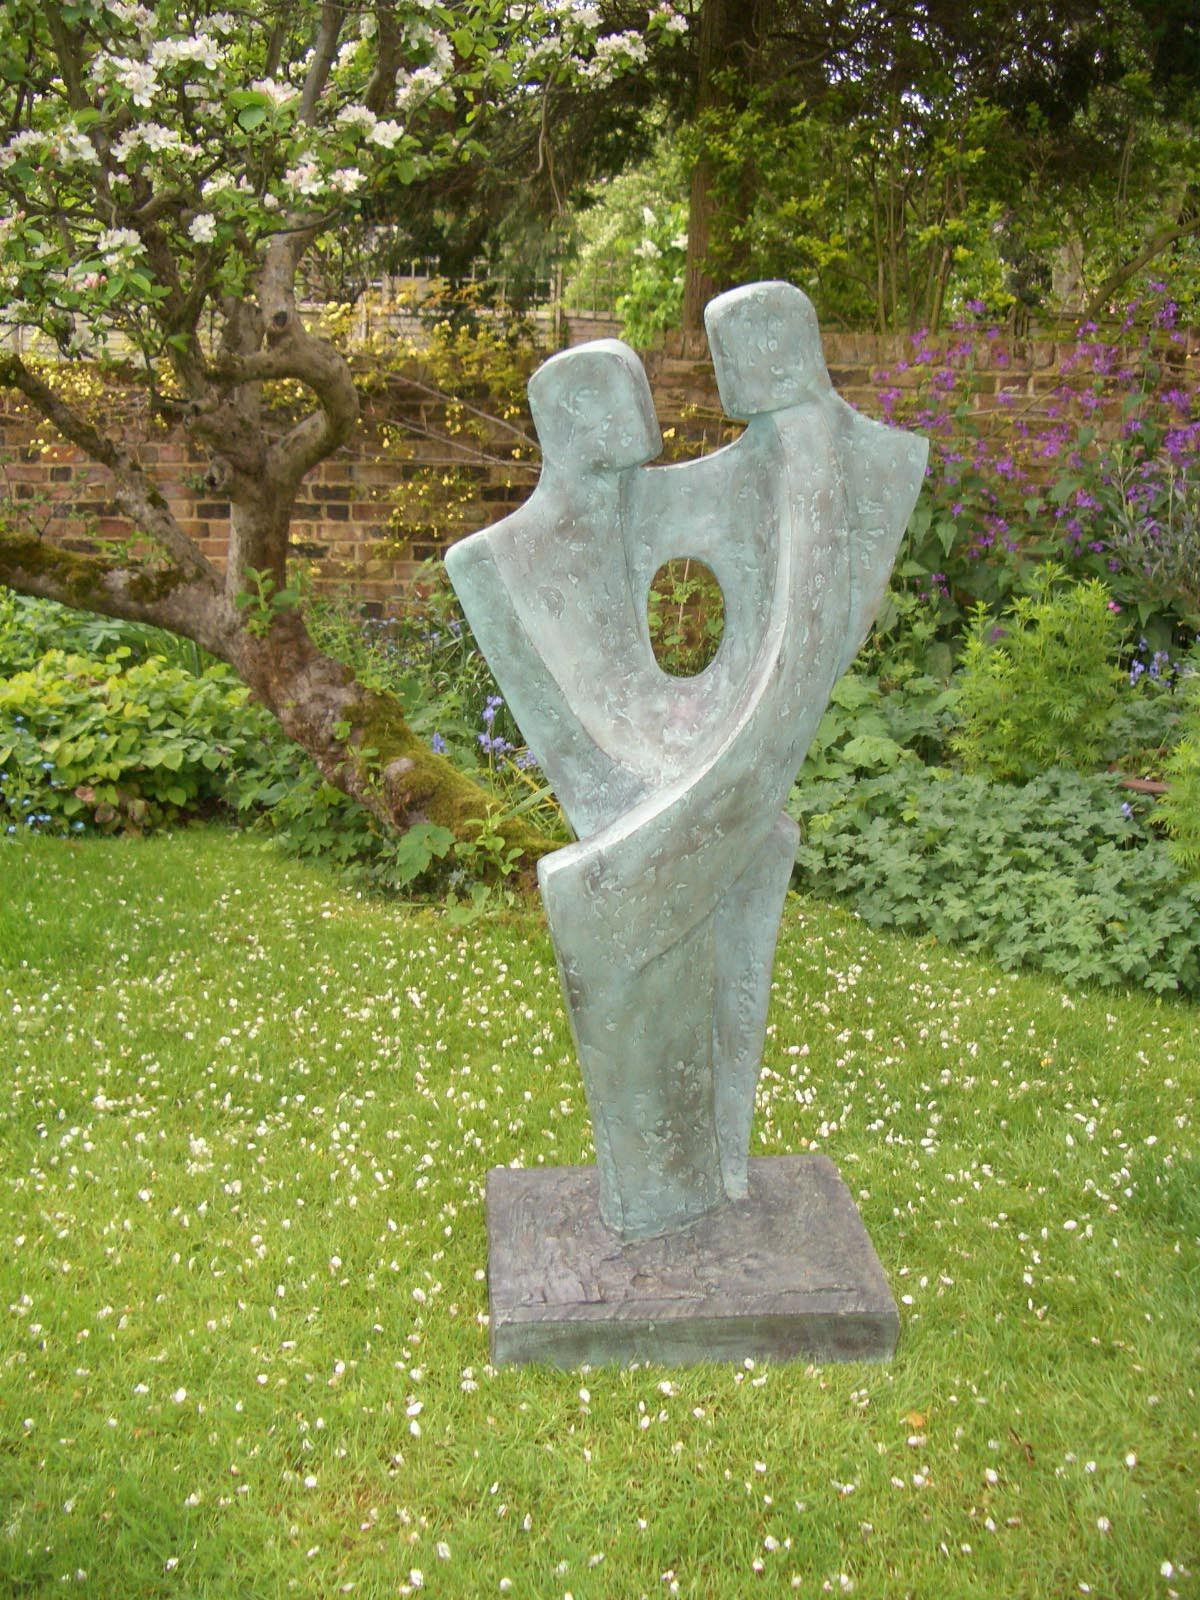 amour vi garden sculpture by john brown in bronze resin price garden sculpture for sale uk